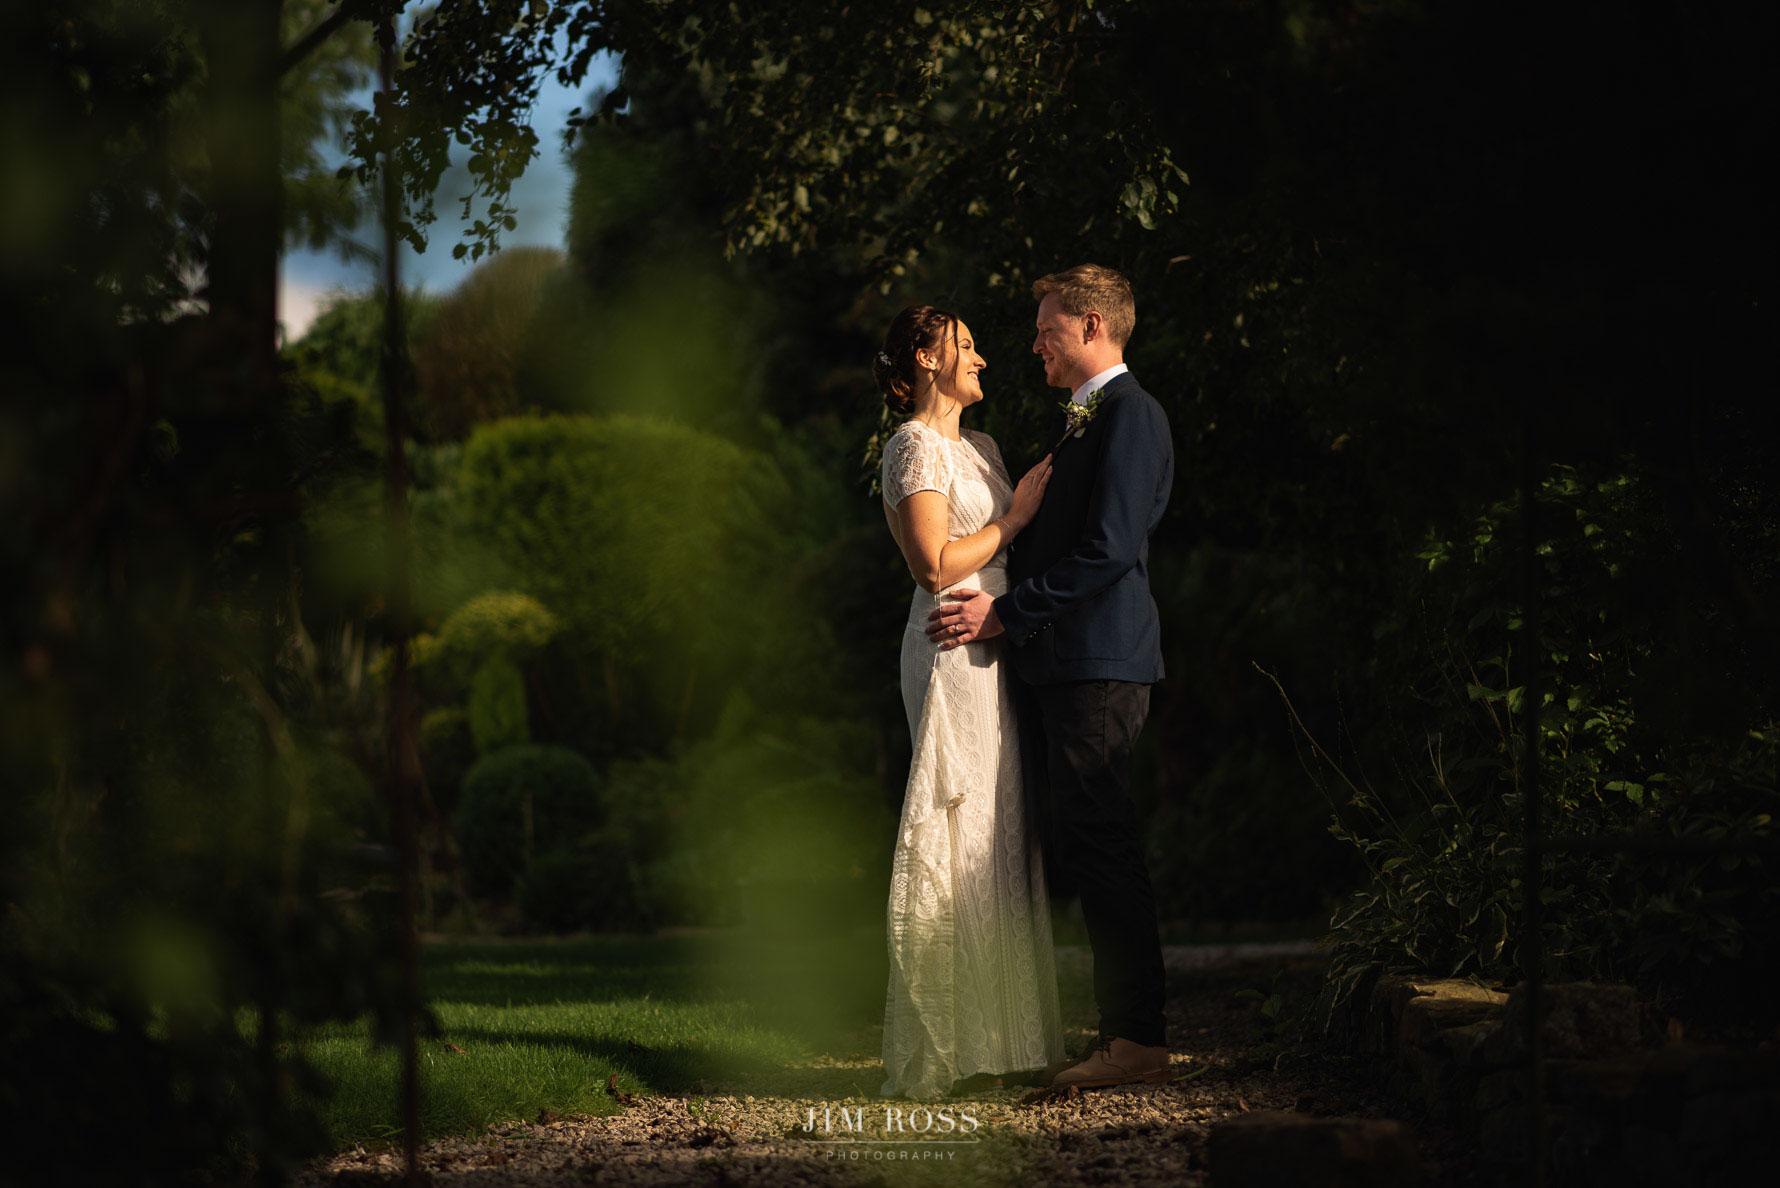 Milnrow wedding couple portrait